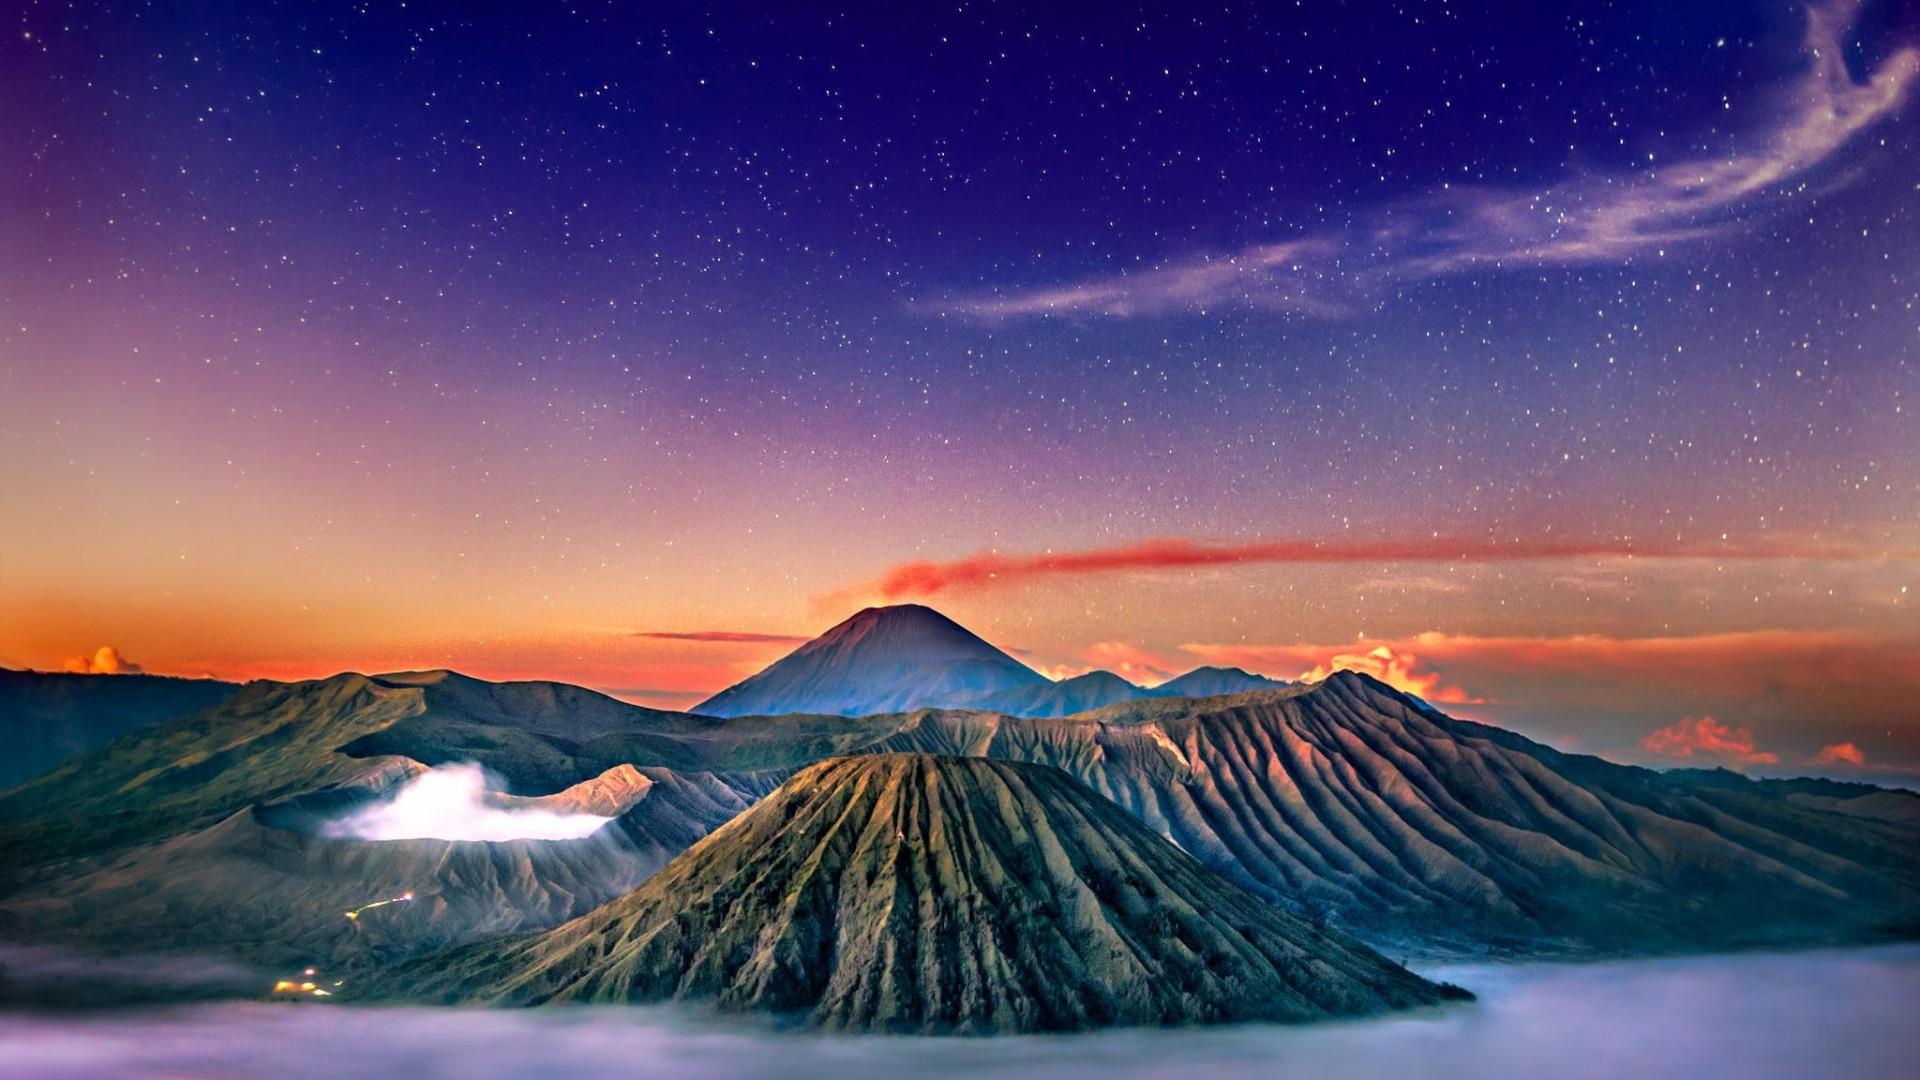 Wallpaper Volcano Stars Landscape Mount Bromo Indonesia 1920x1080 Wallsp 1469591 Hd Wallpapers Wallhere